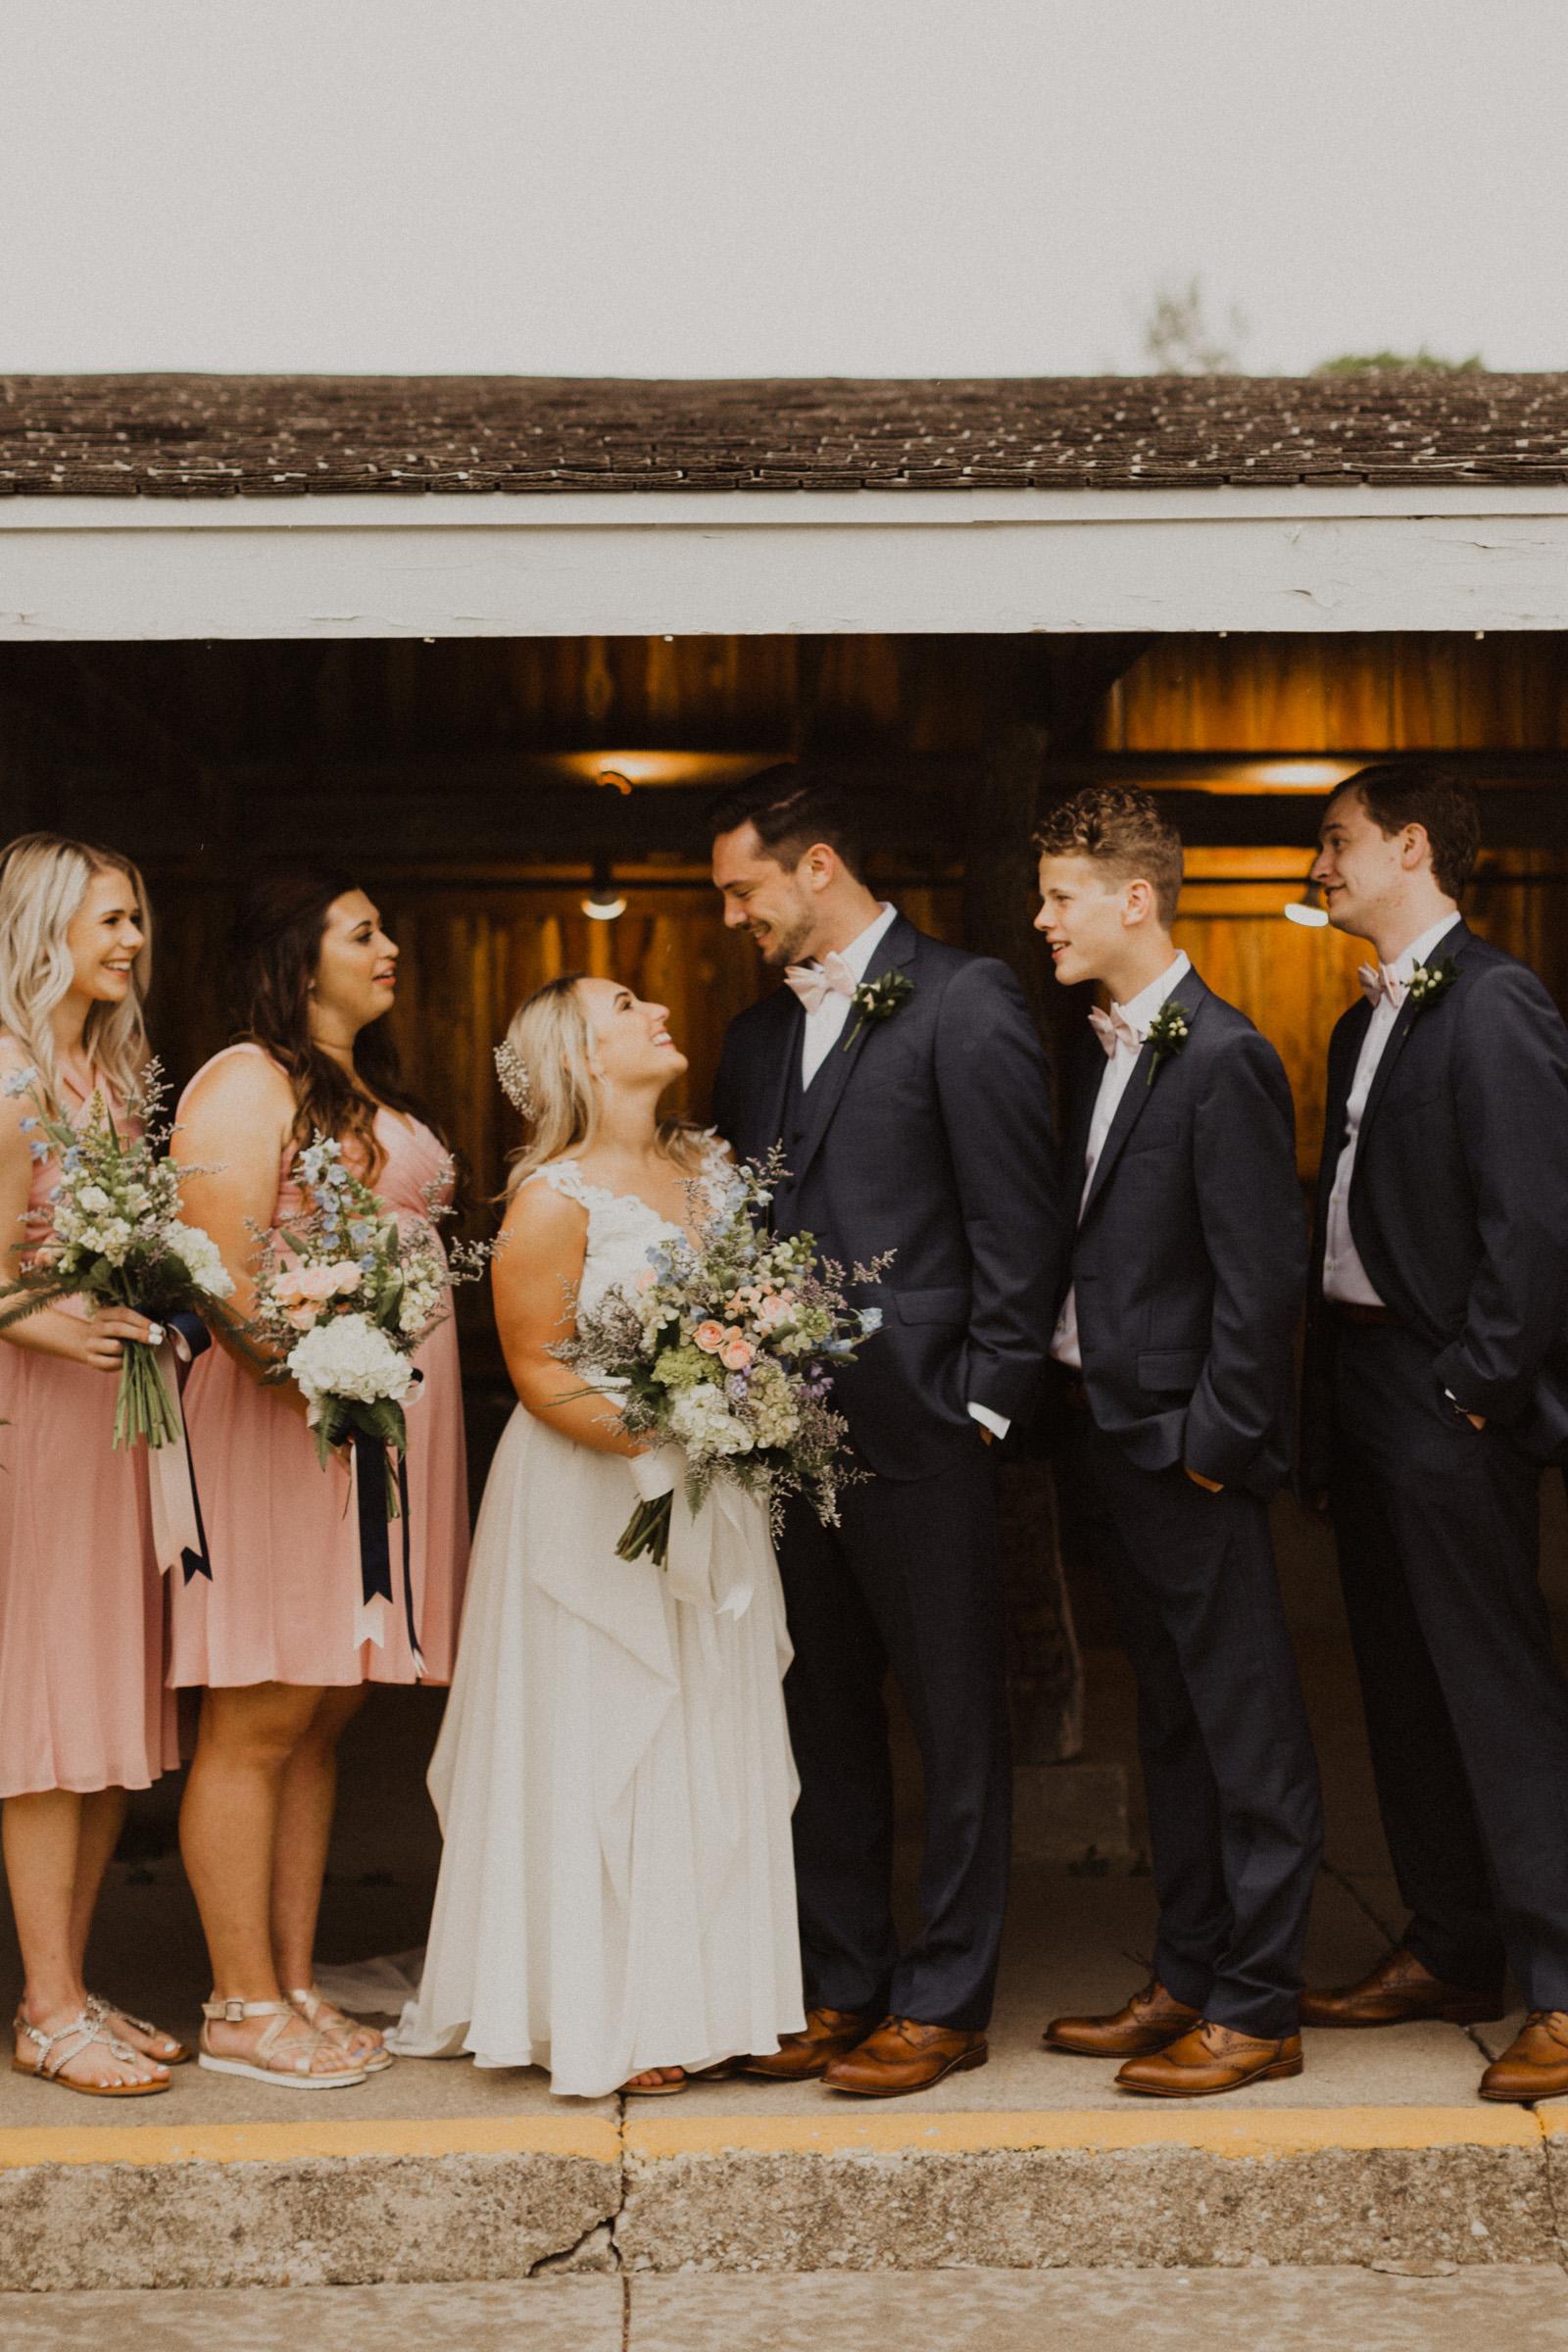 alyssa barletter photography nelson wedding nebraska city lied lodge morton barn spring wedding photographer-18.jpg